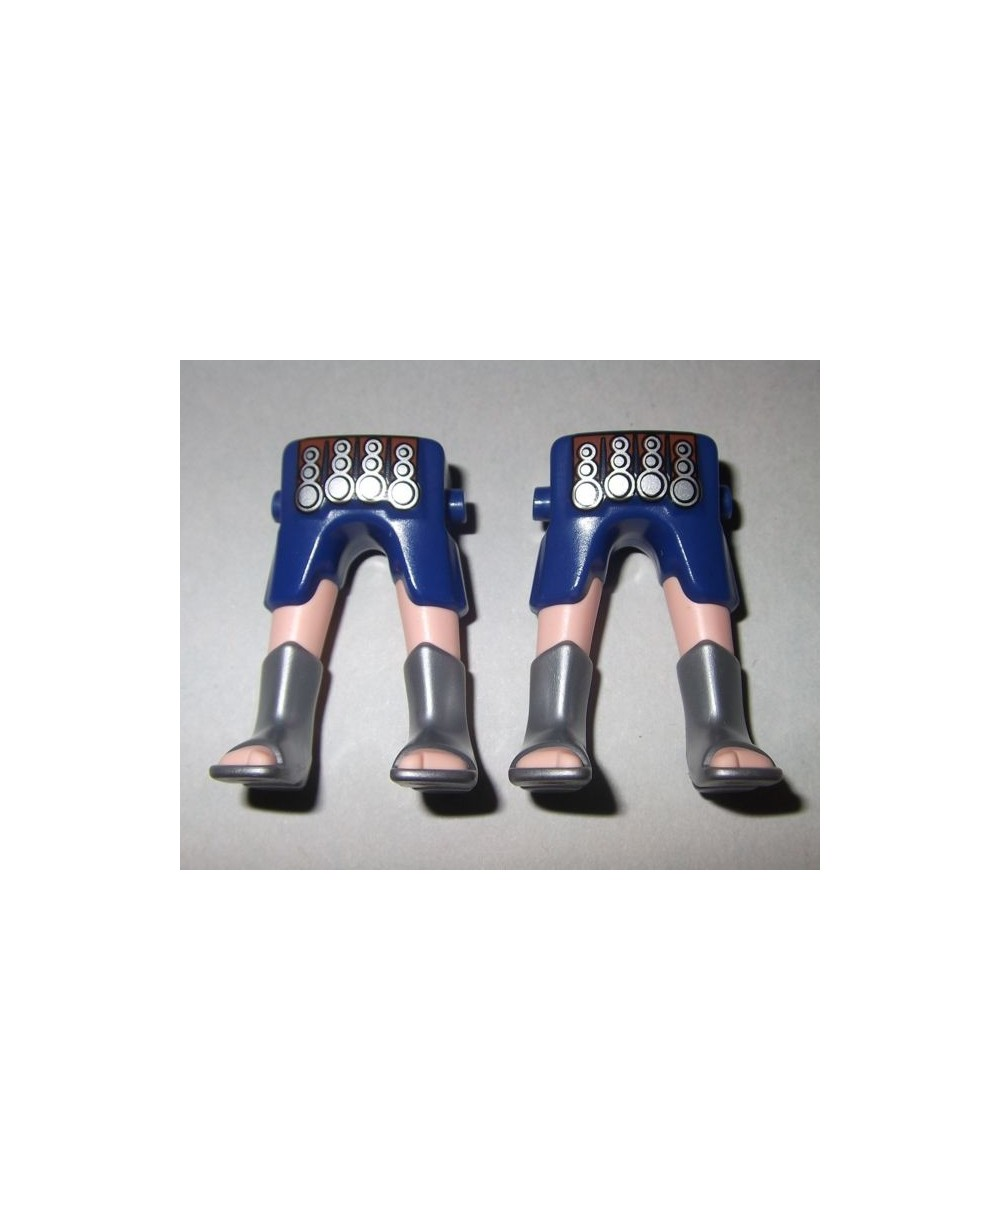 166662 roman legs blue and gold 2u playmobil leg